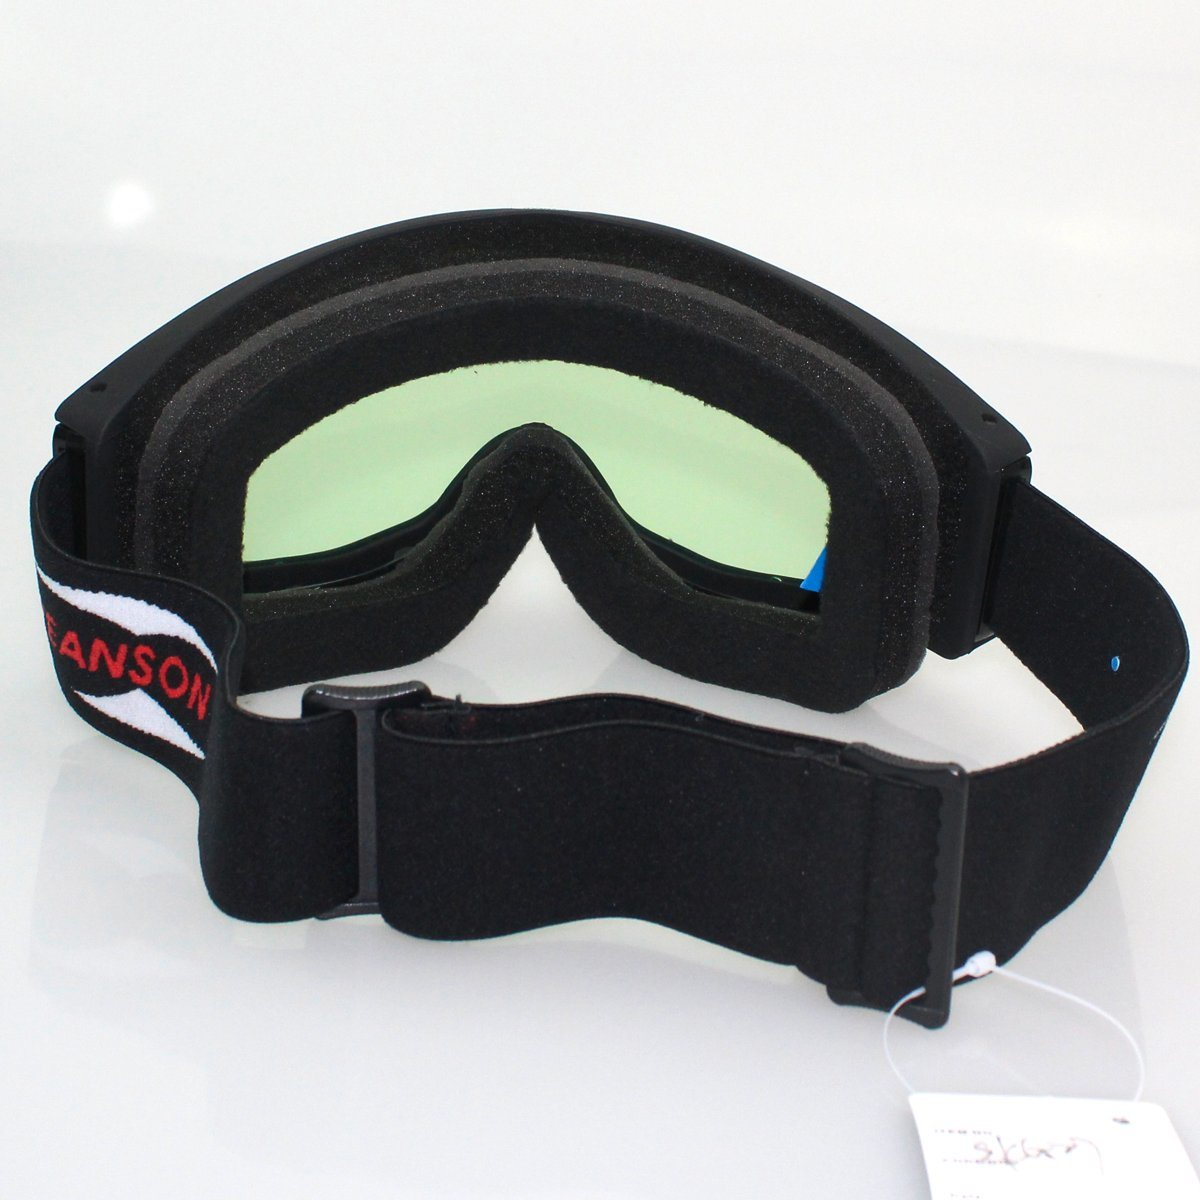 Reanson Flexible Anti-Fog Anti-Scratch Motorcross Goggles